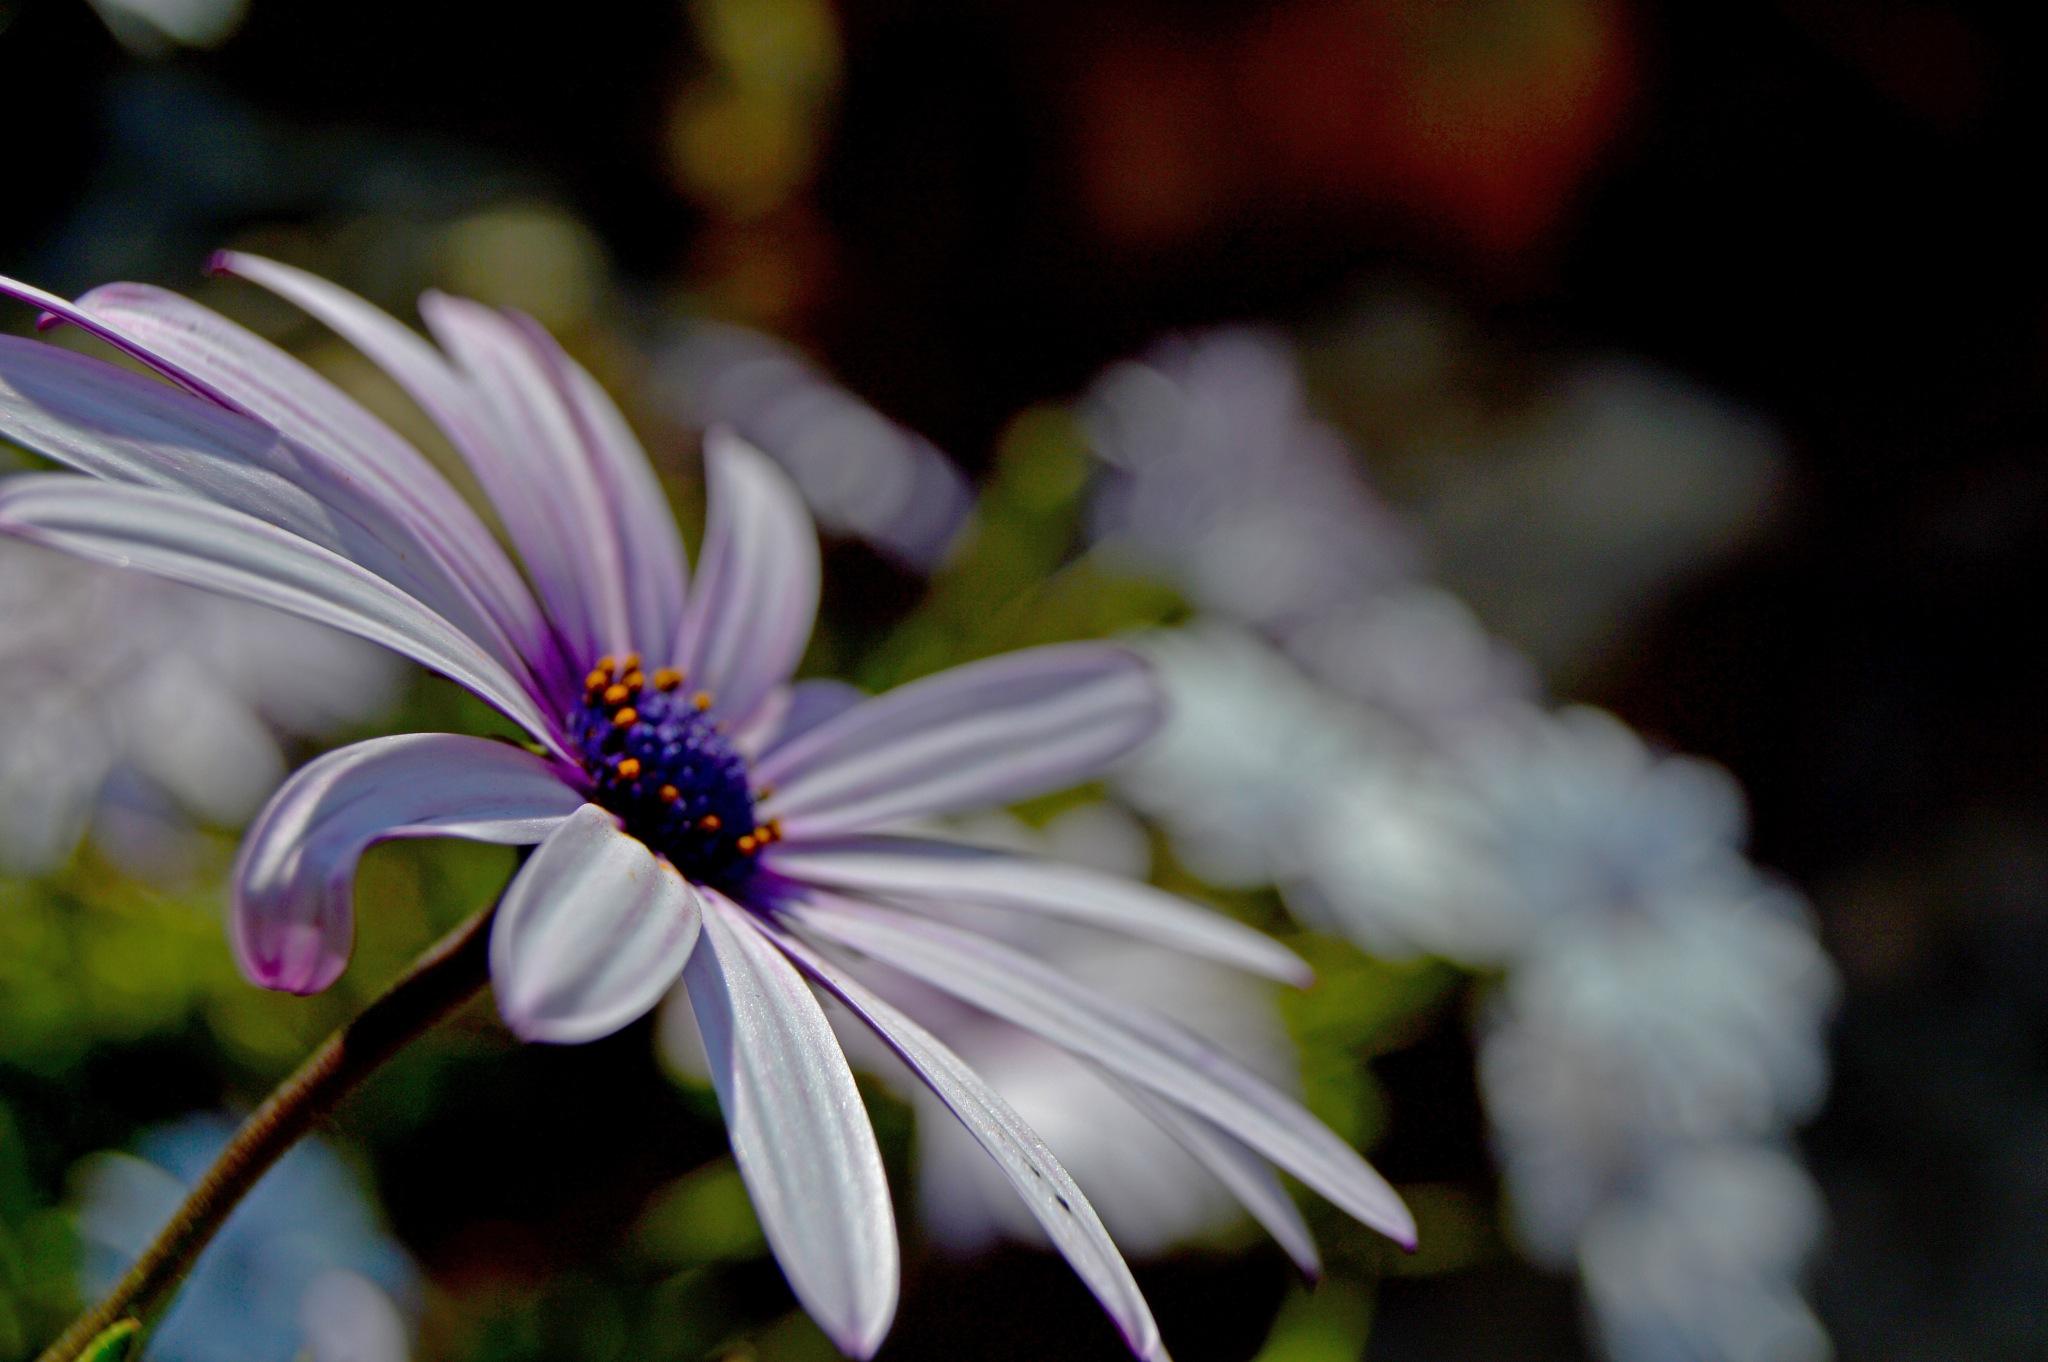 soft petals by Finn_photography